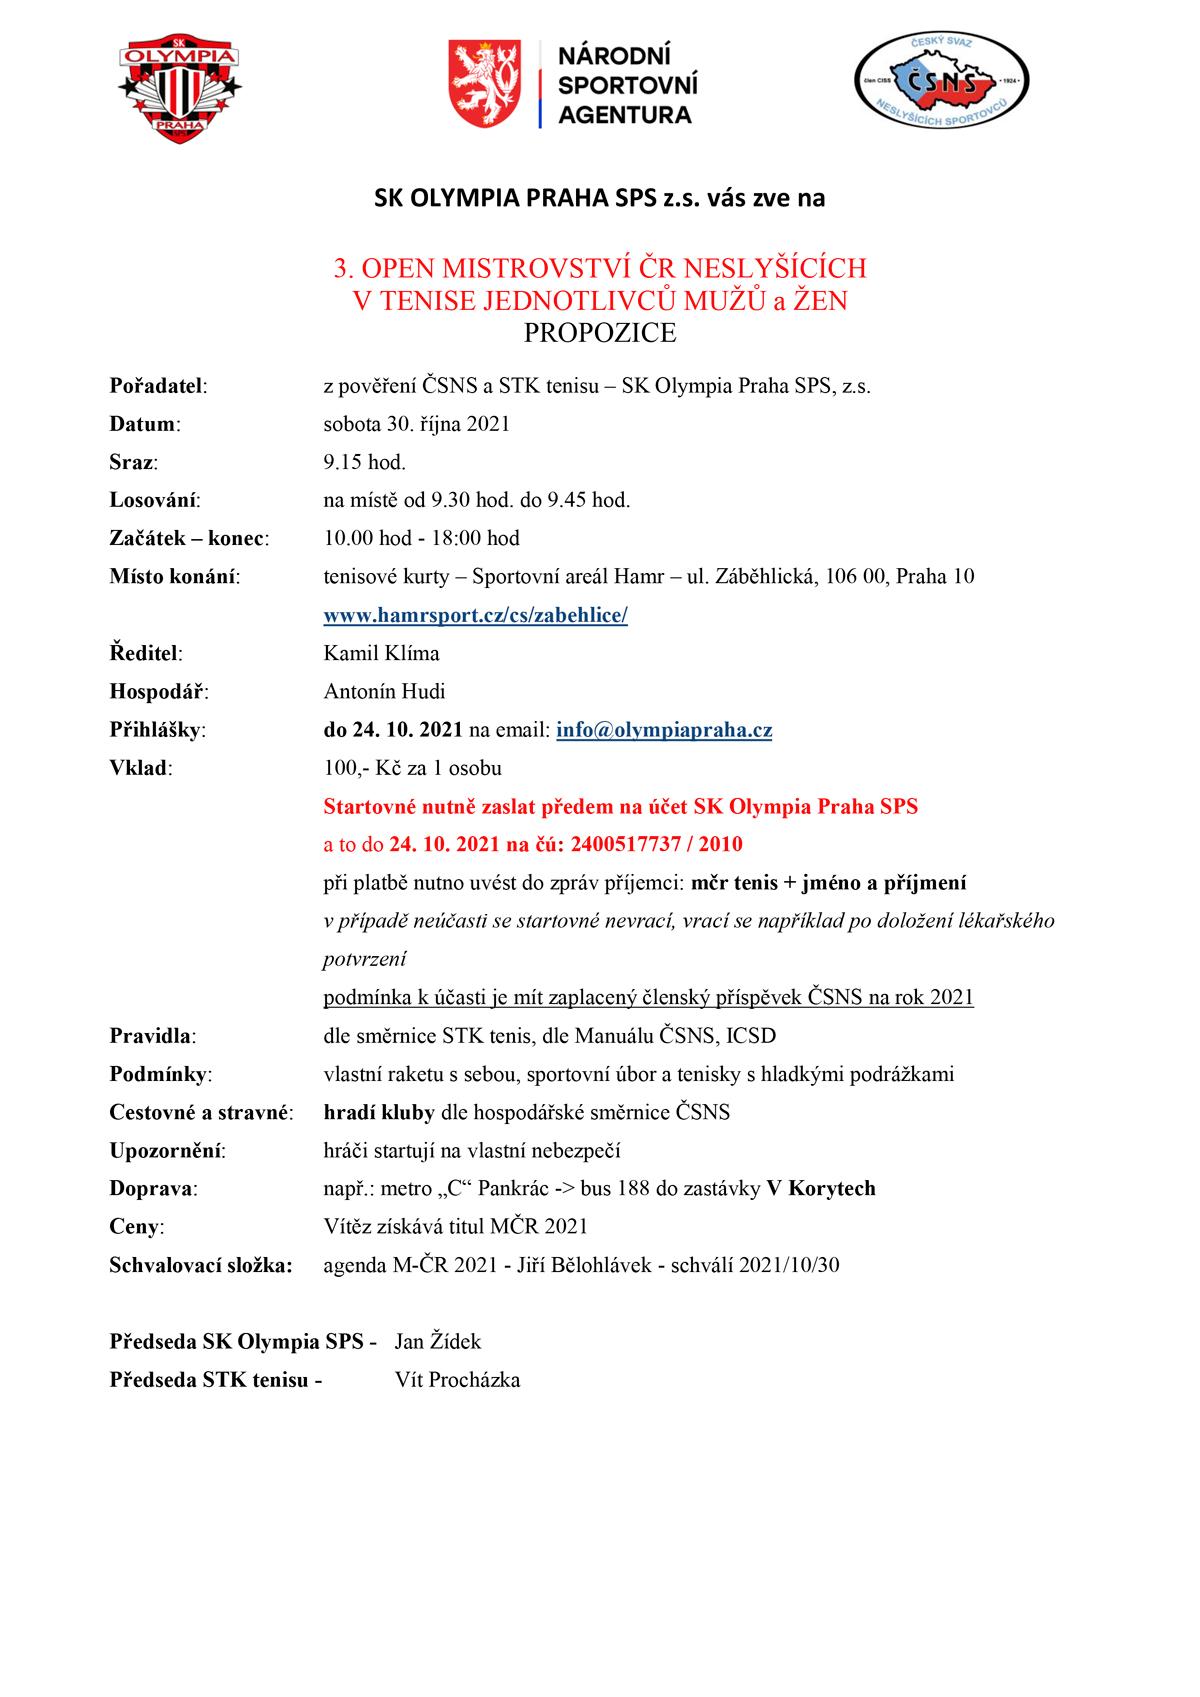 Propozice-3.-OPEN-MČR-v-tenise-v-Praze-30